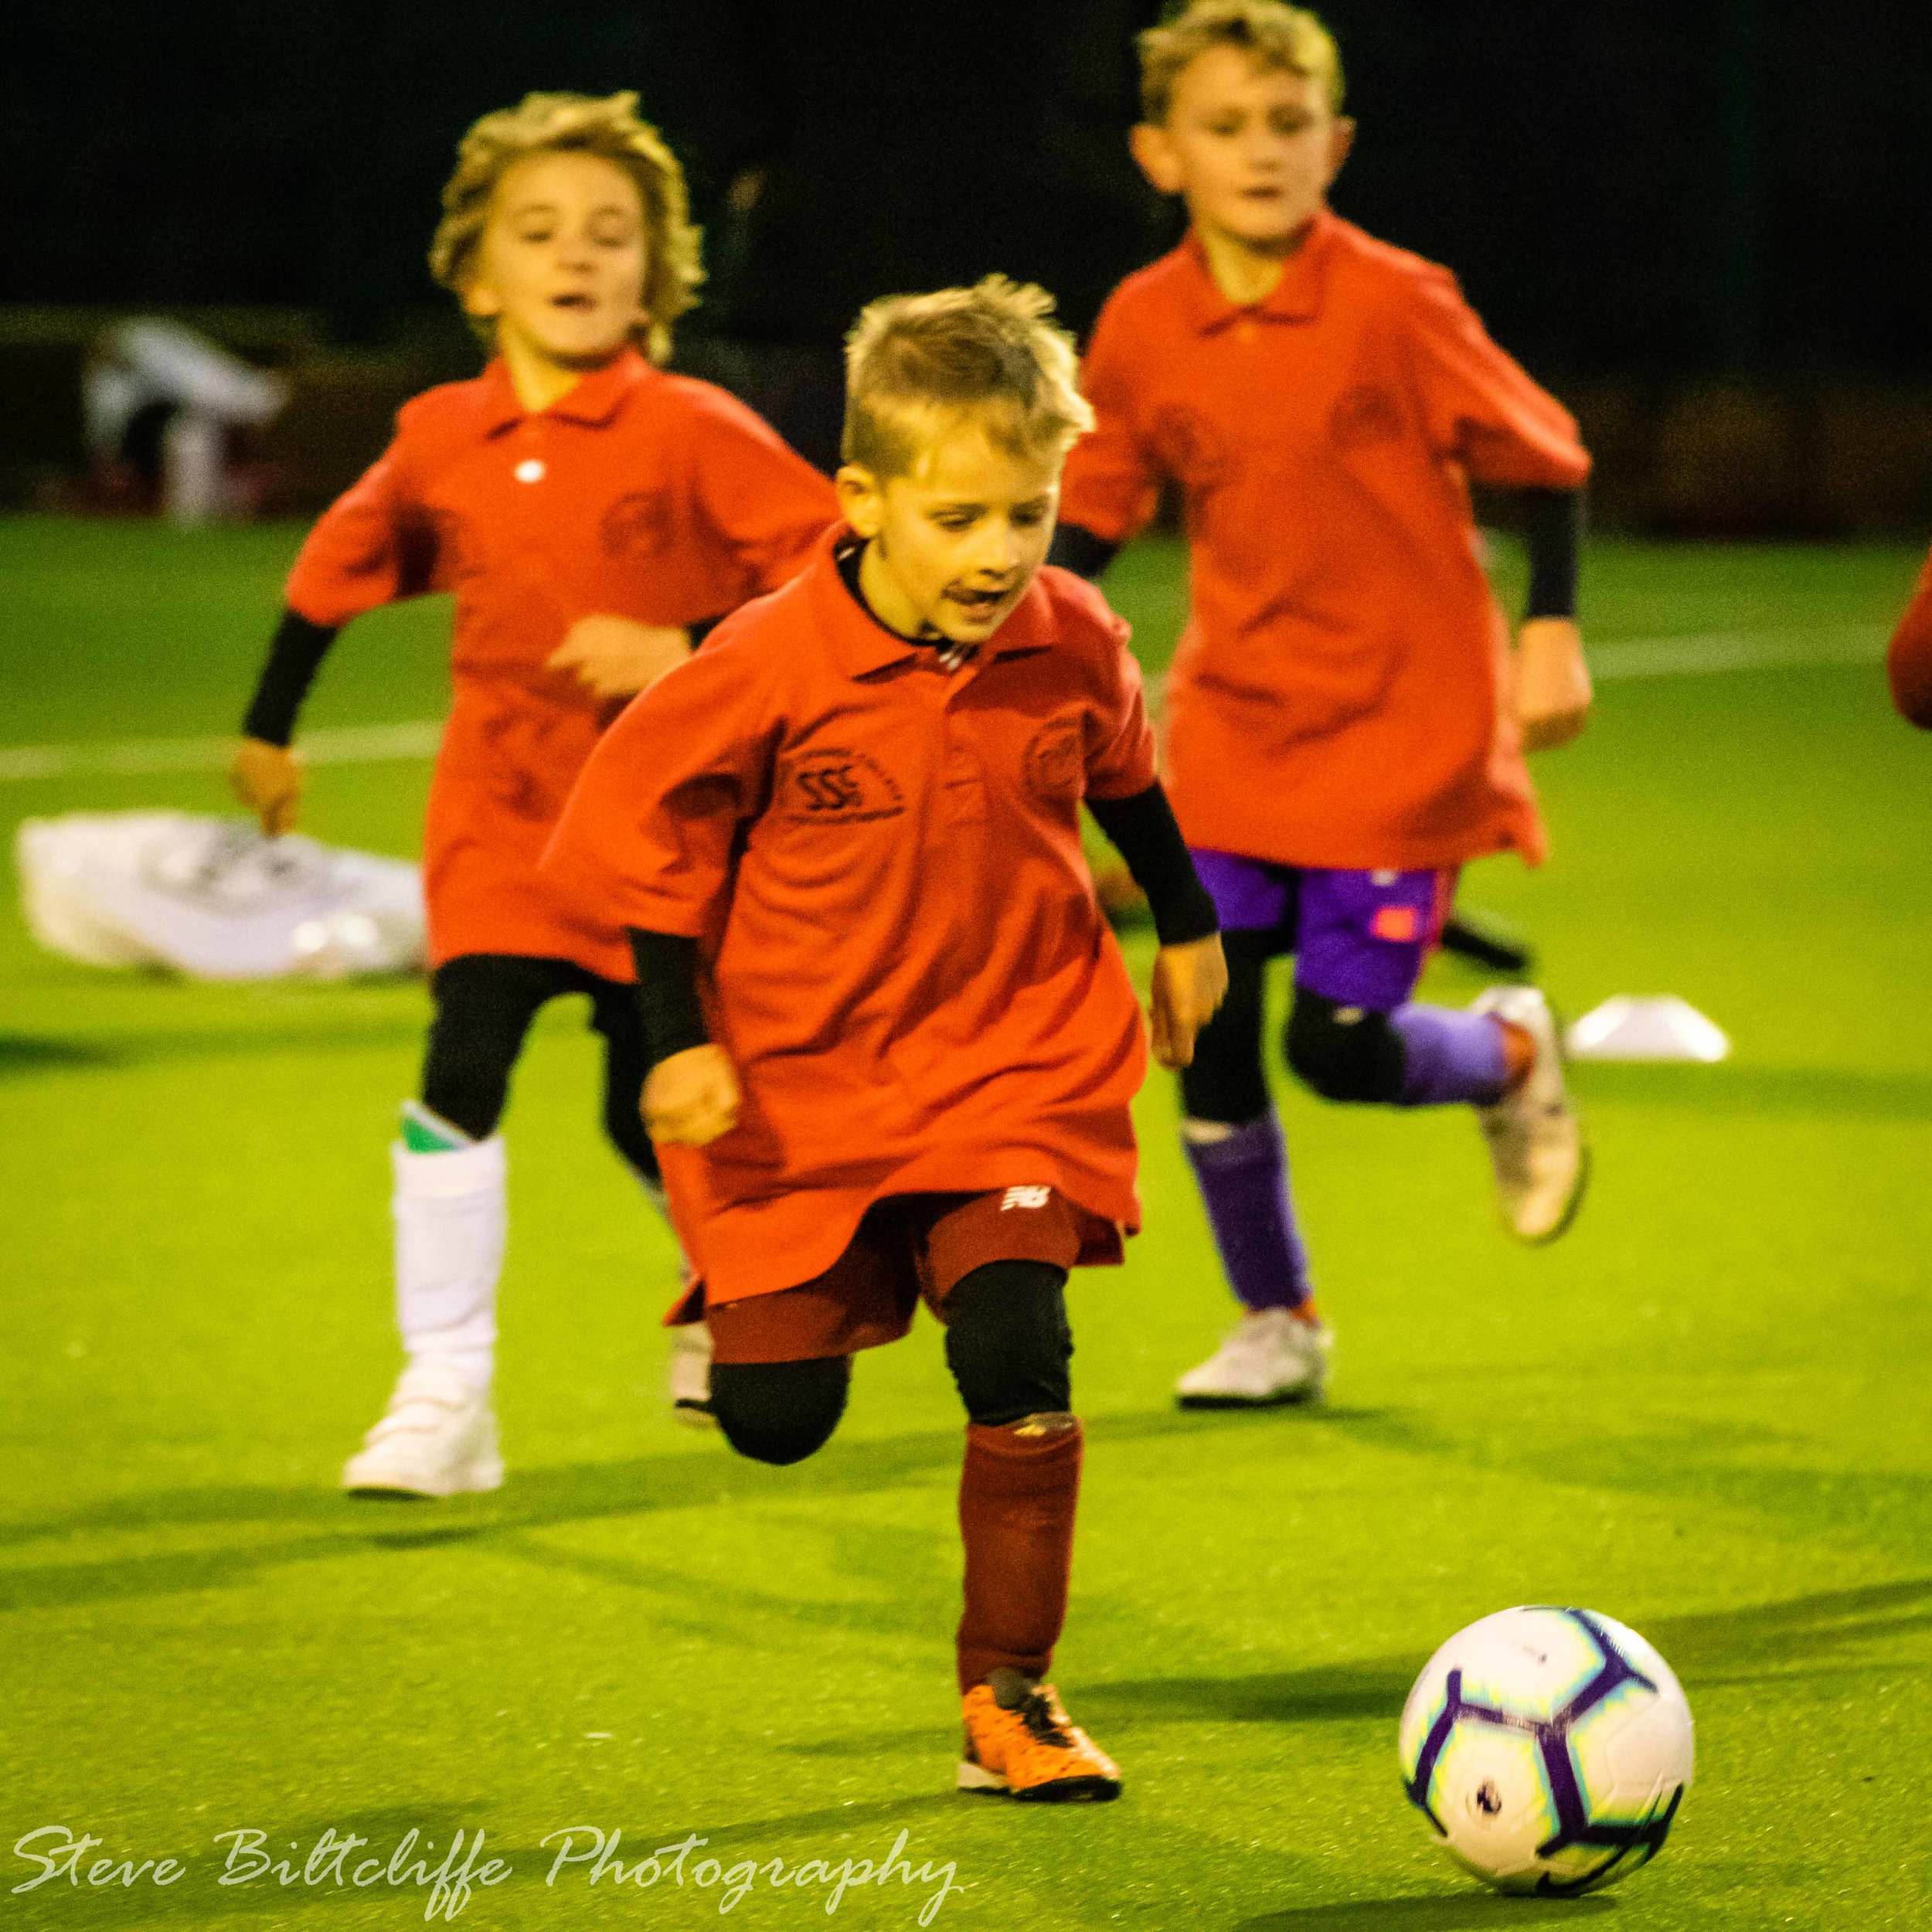 Year 1/2 Football - Monday 18th November@ Crofton Academy